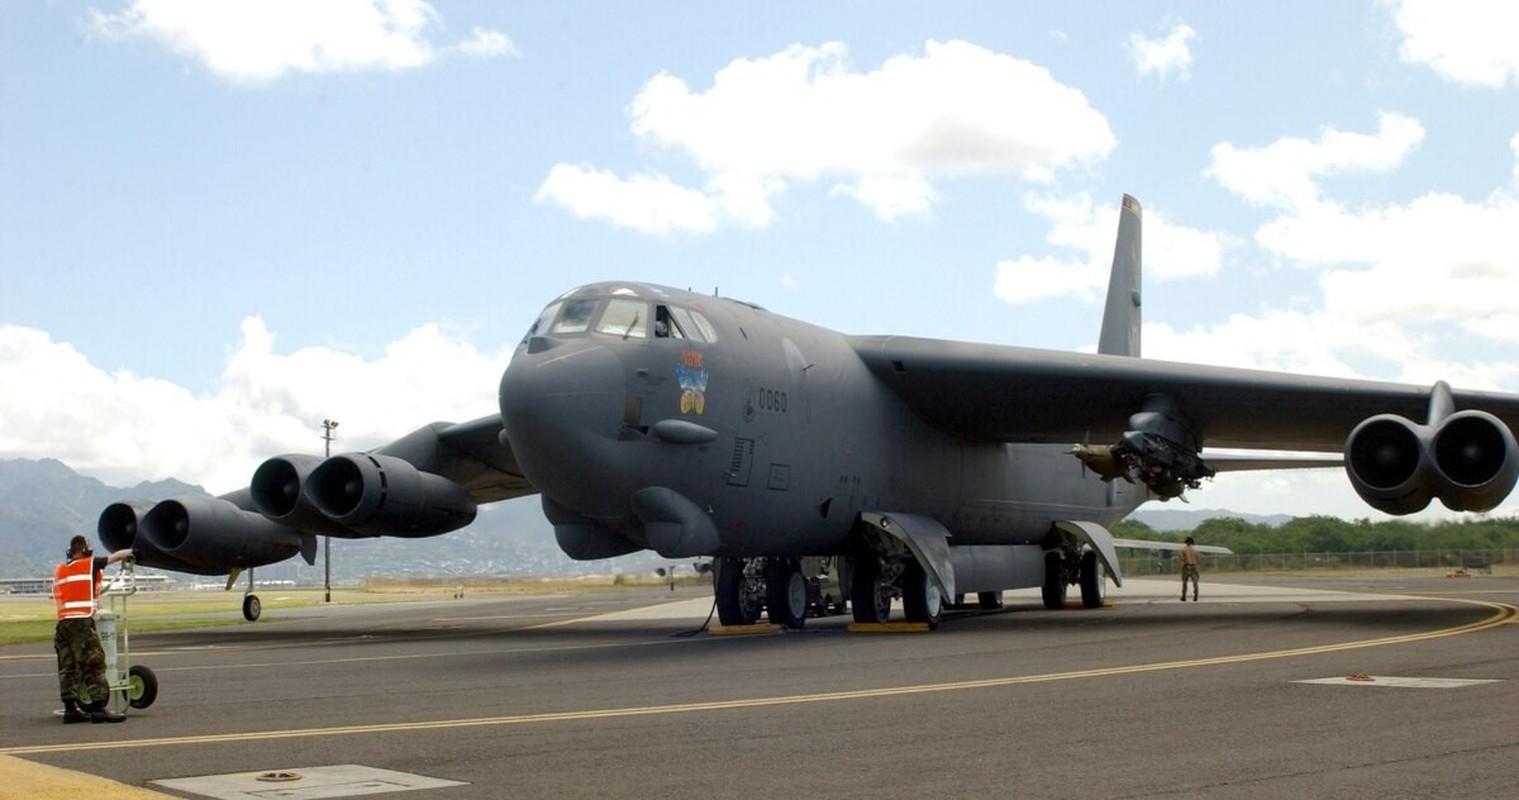 Phao dai bay B-52 My ap sat ban dao Crimea, Nga lo sot vo-Hinh-3